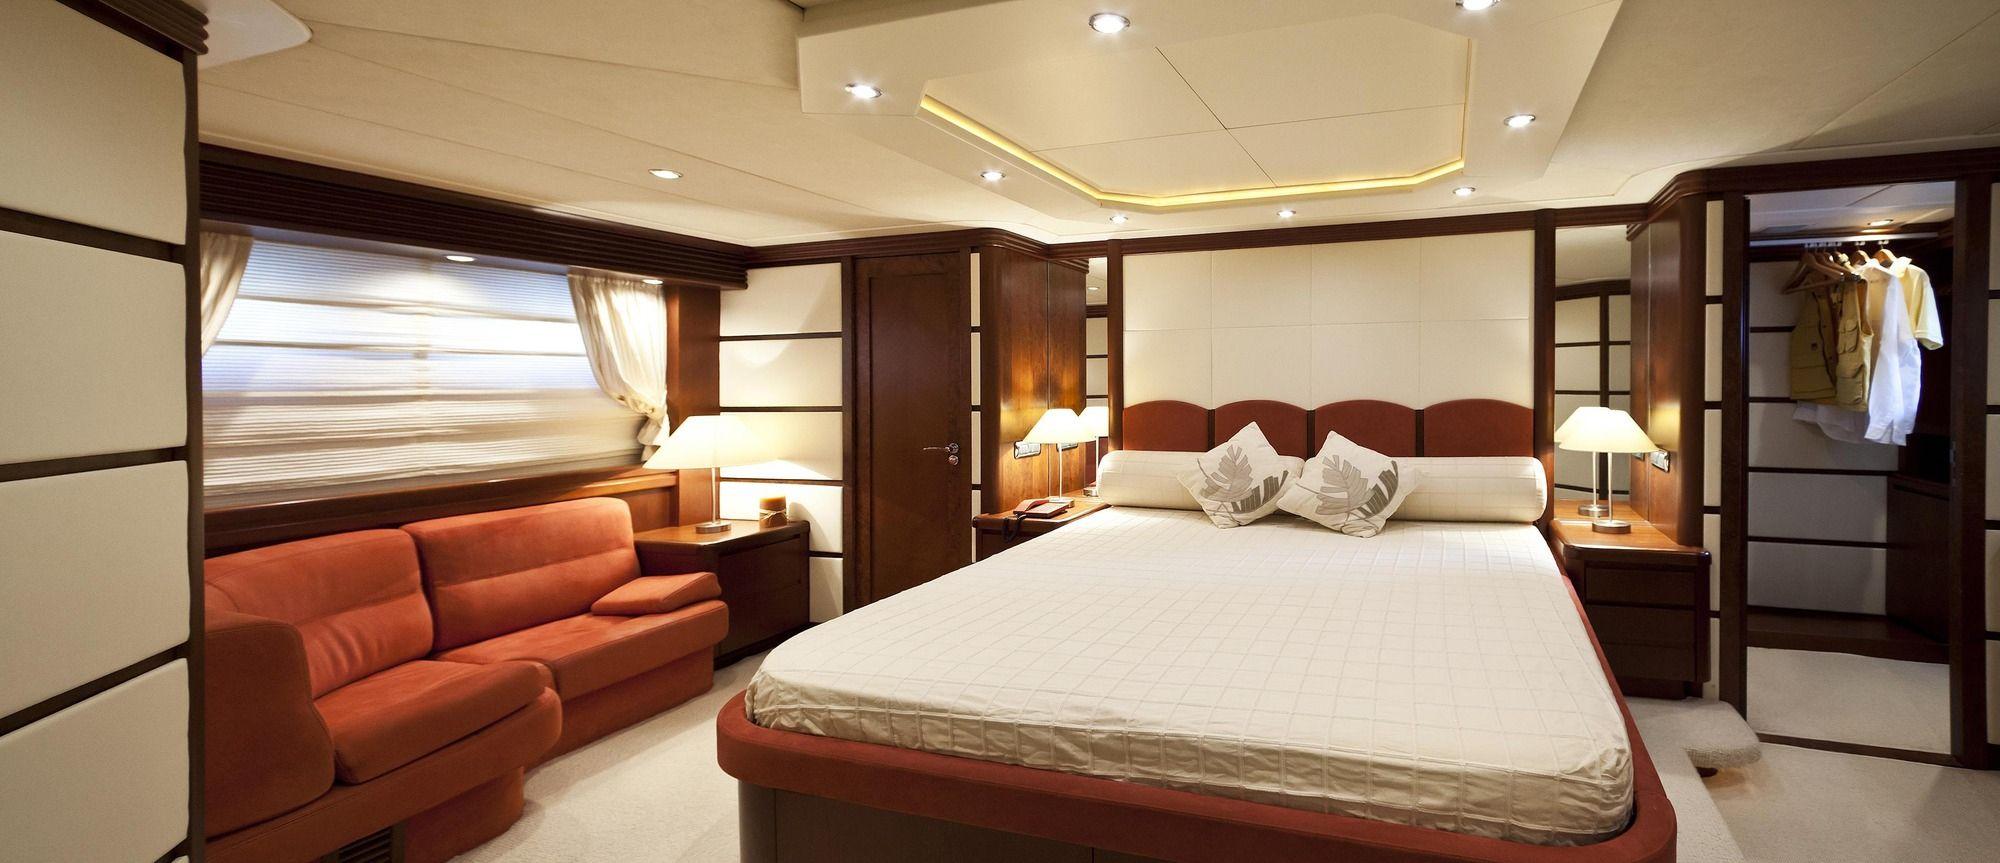 LADY P - Crewed Motor Yacht - Master